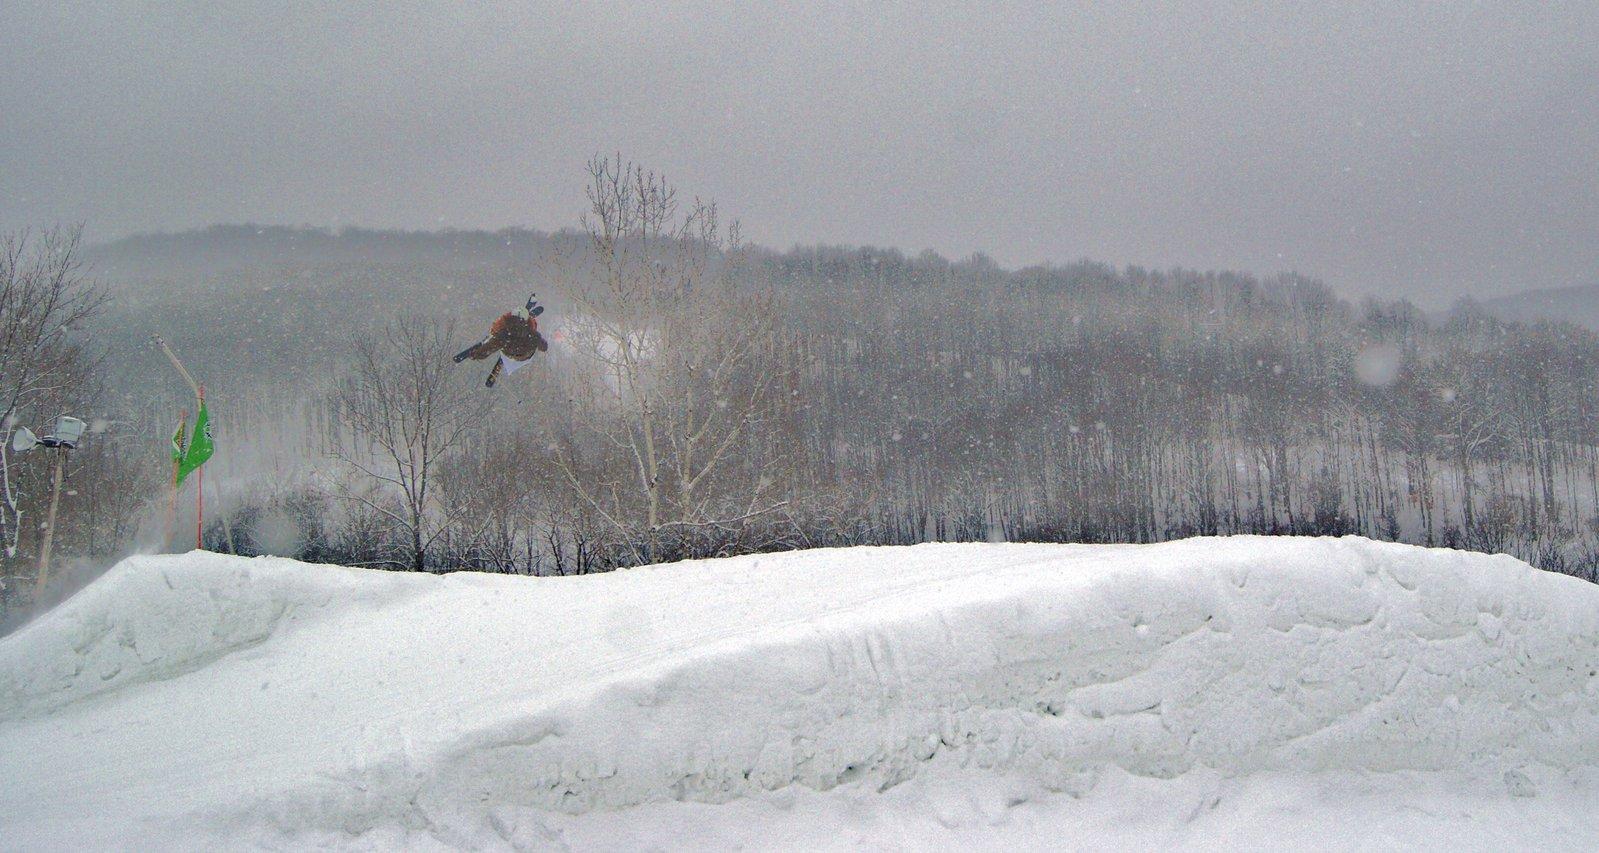 Cork 9 on a snowy day